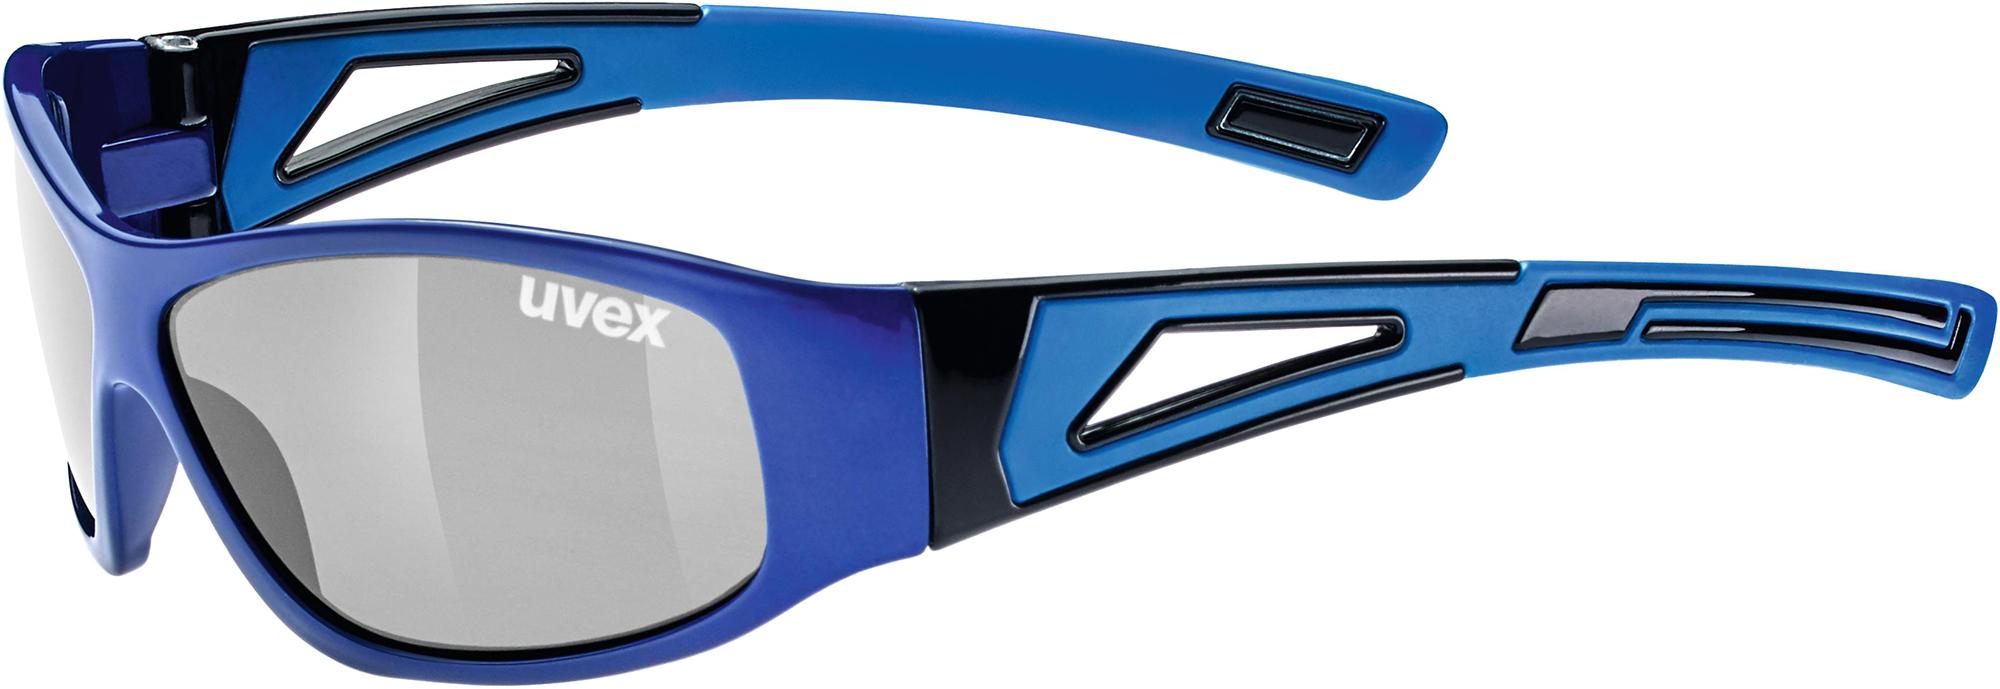 Uvex Солнцезащитные очки детские Uvex Sportstyle 509